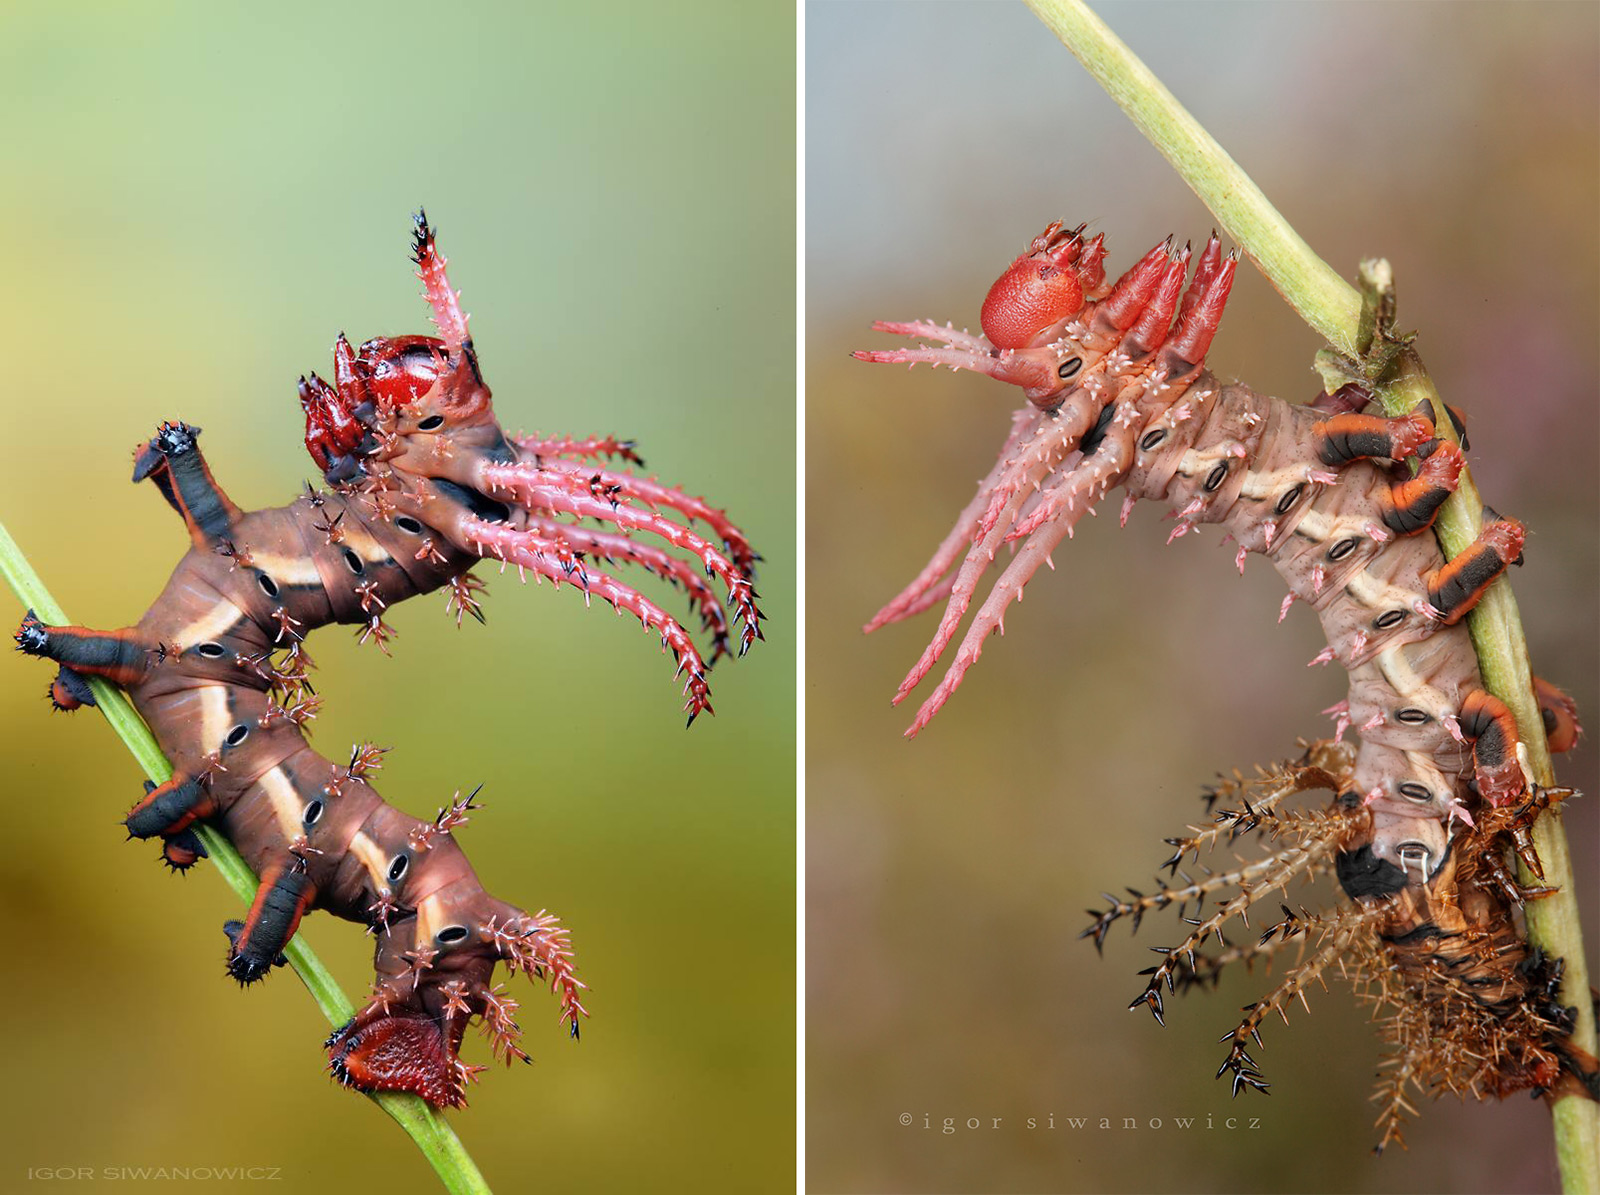 Radically Unusual Caterpillars Captured by Photographer Igor Siwanowicz